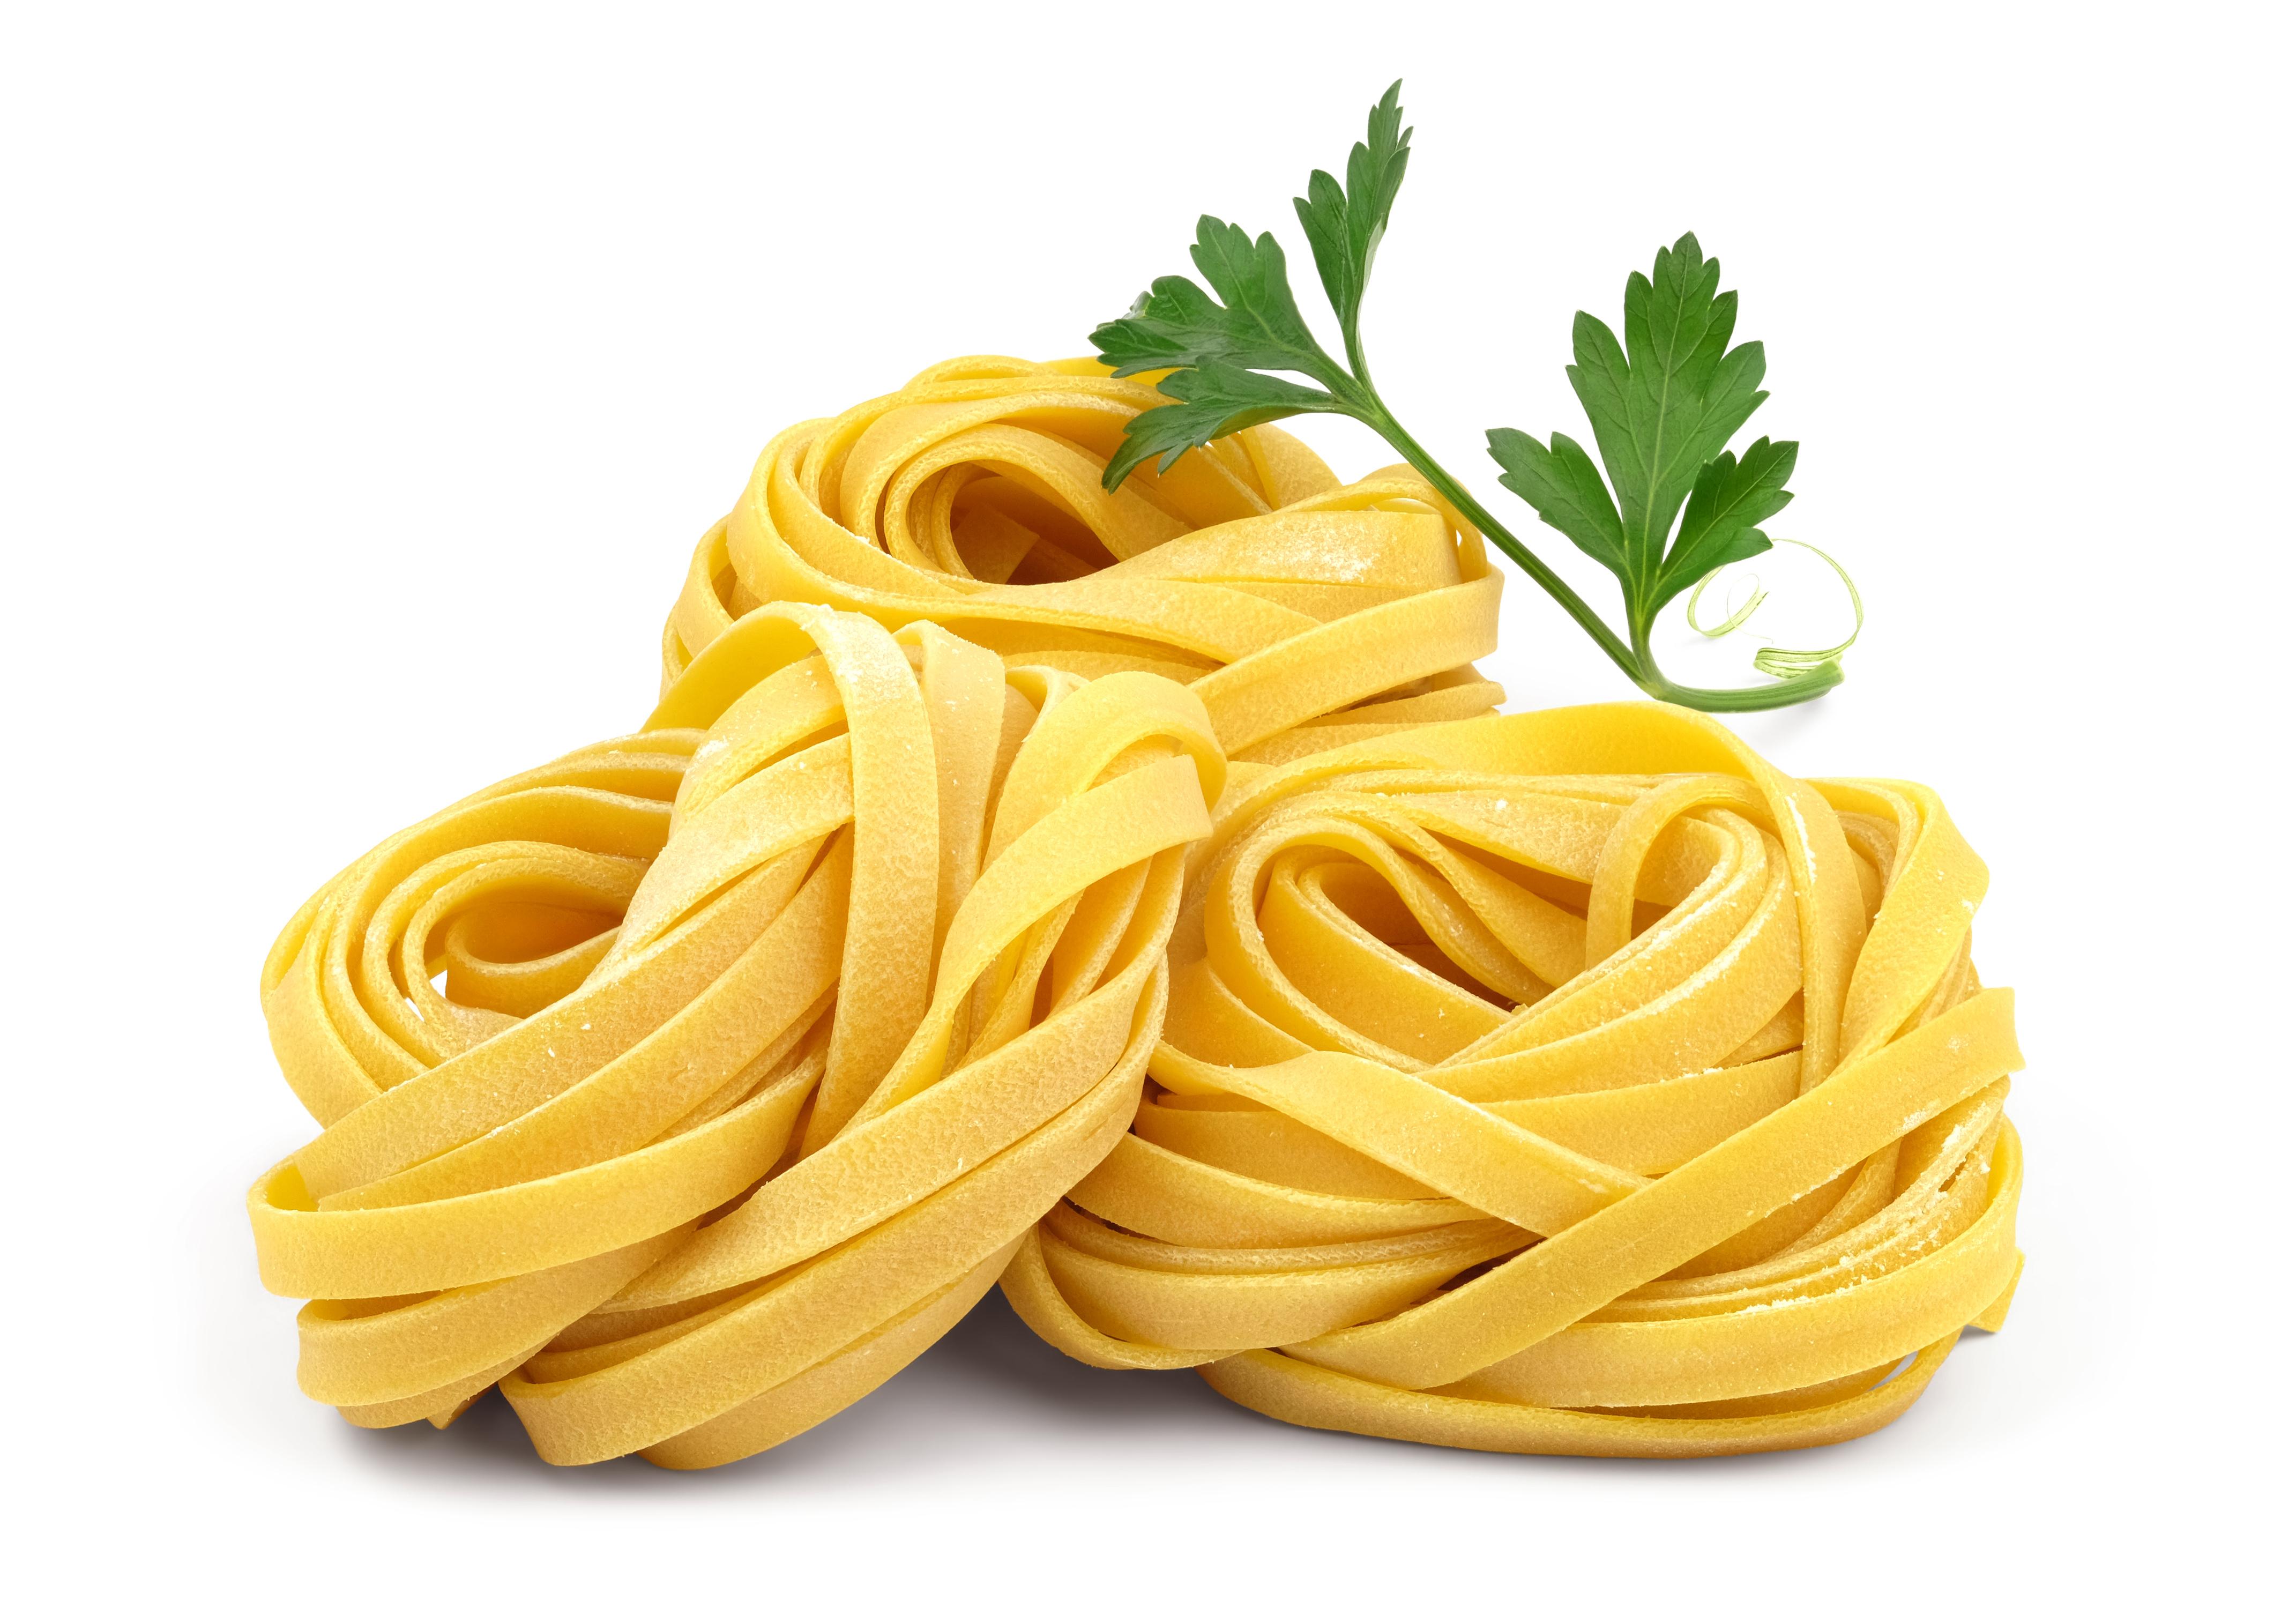 Italian rolled fresh fettuccine pasta